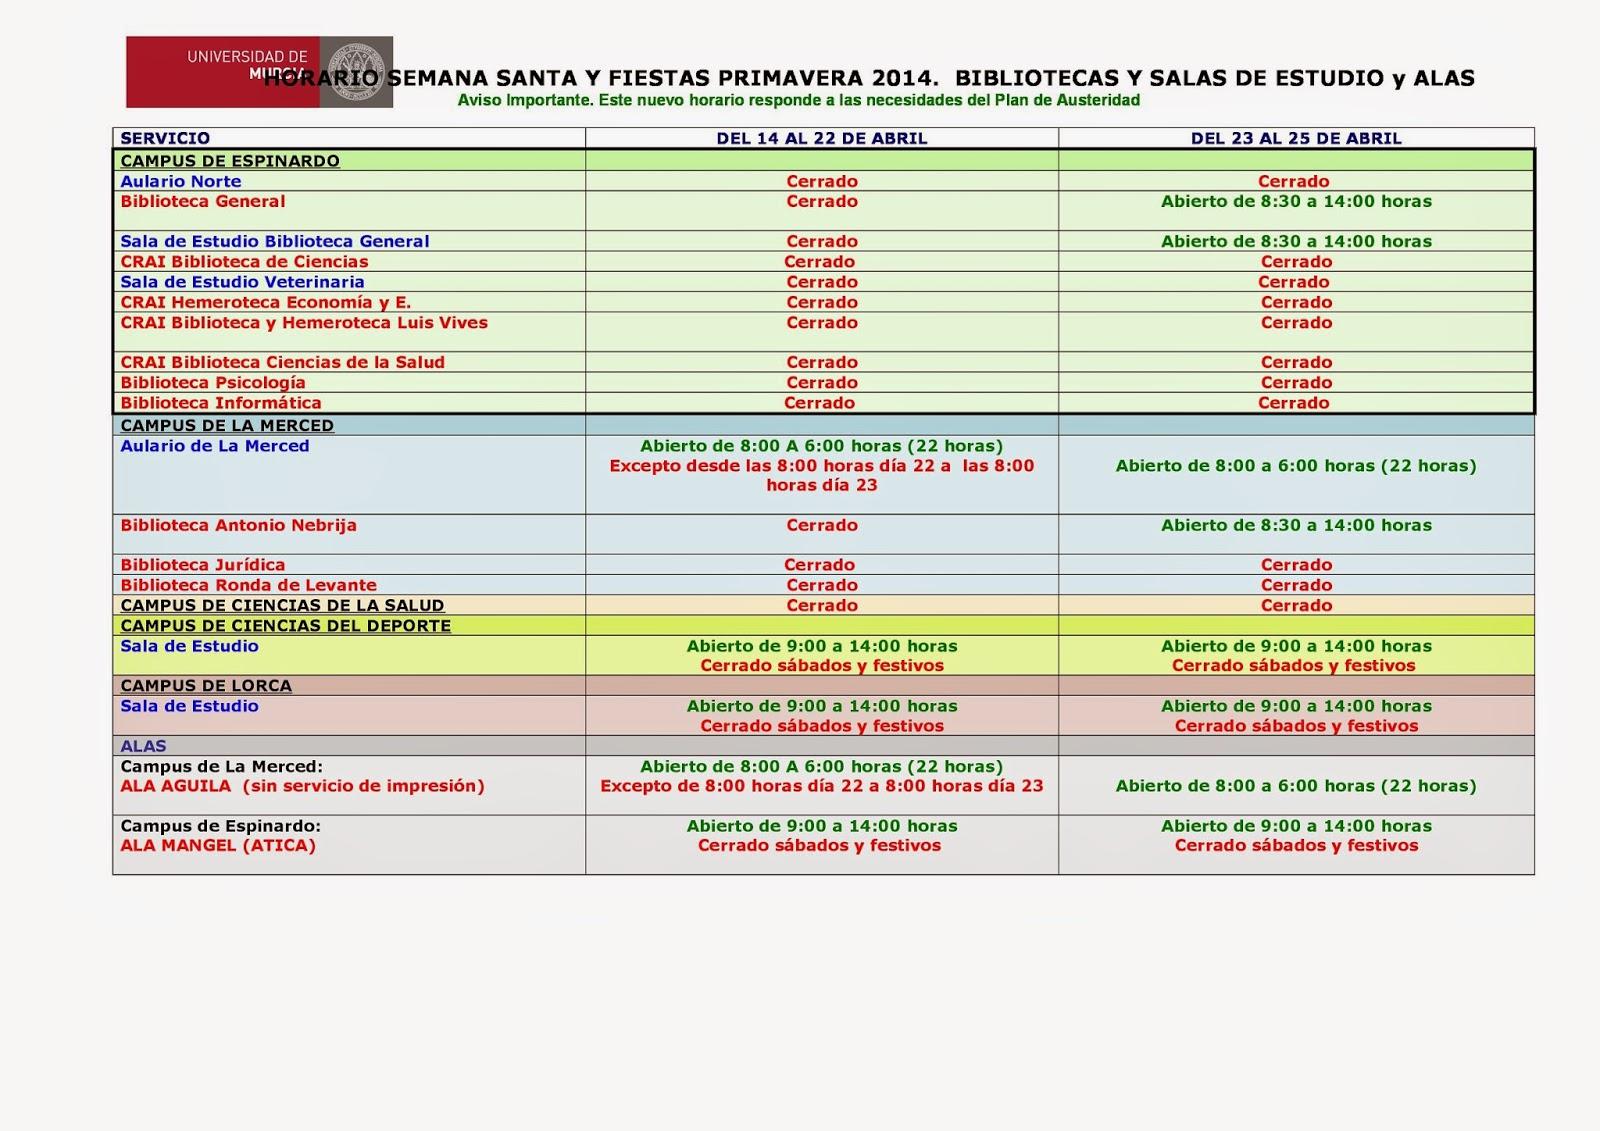 Horario extraordinario Semana Santa 2014